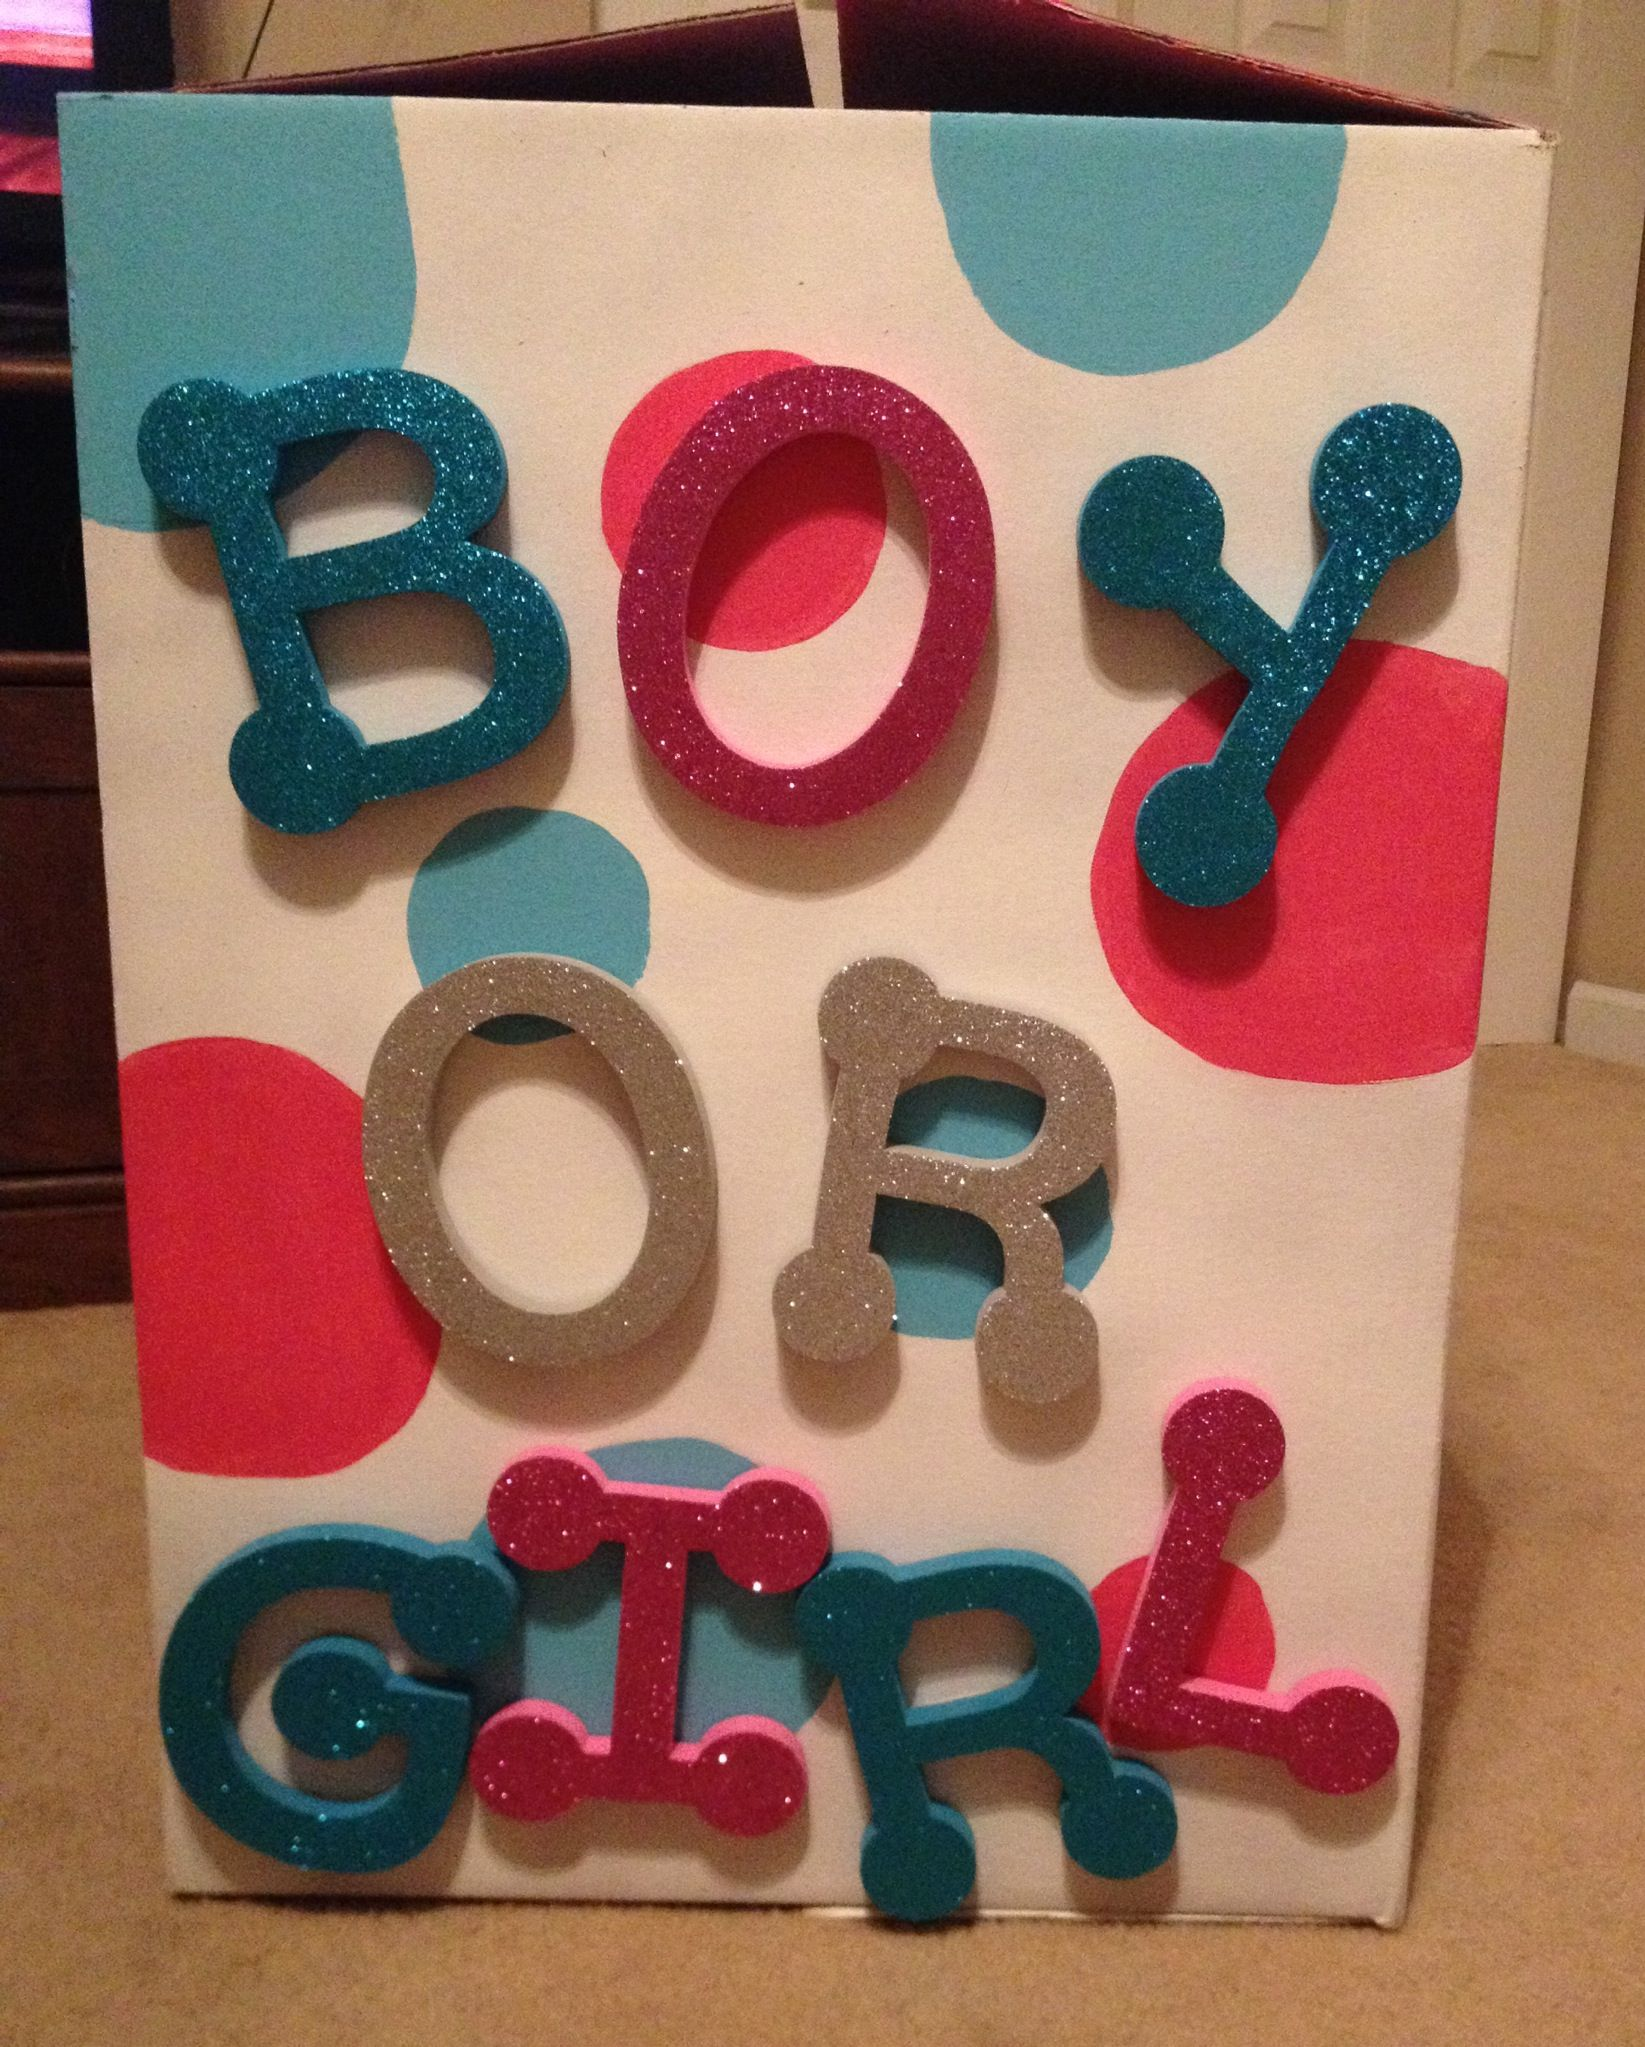 Gender Reveal Balloon Box All Supplies Found At Wal Mart Gender Reveal Party Theme Gender Reveal Balloons Gender Reveal Shower